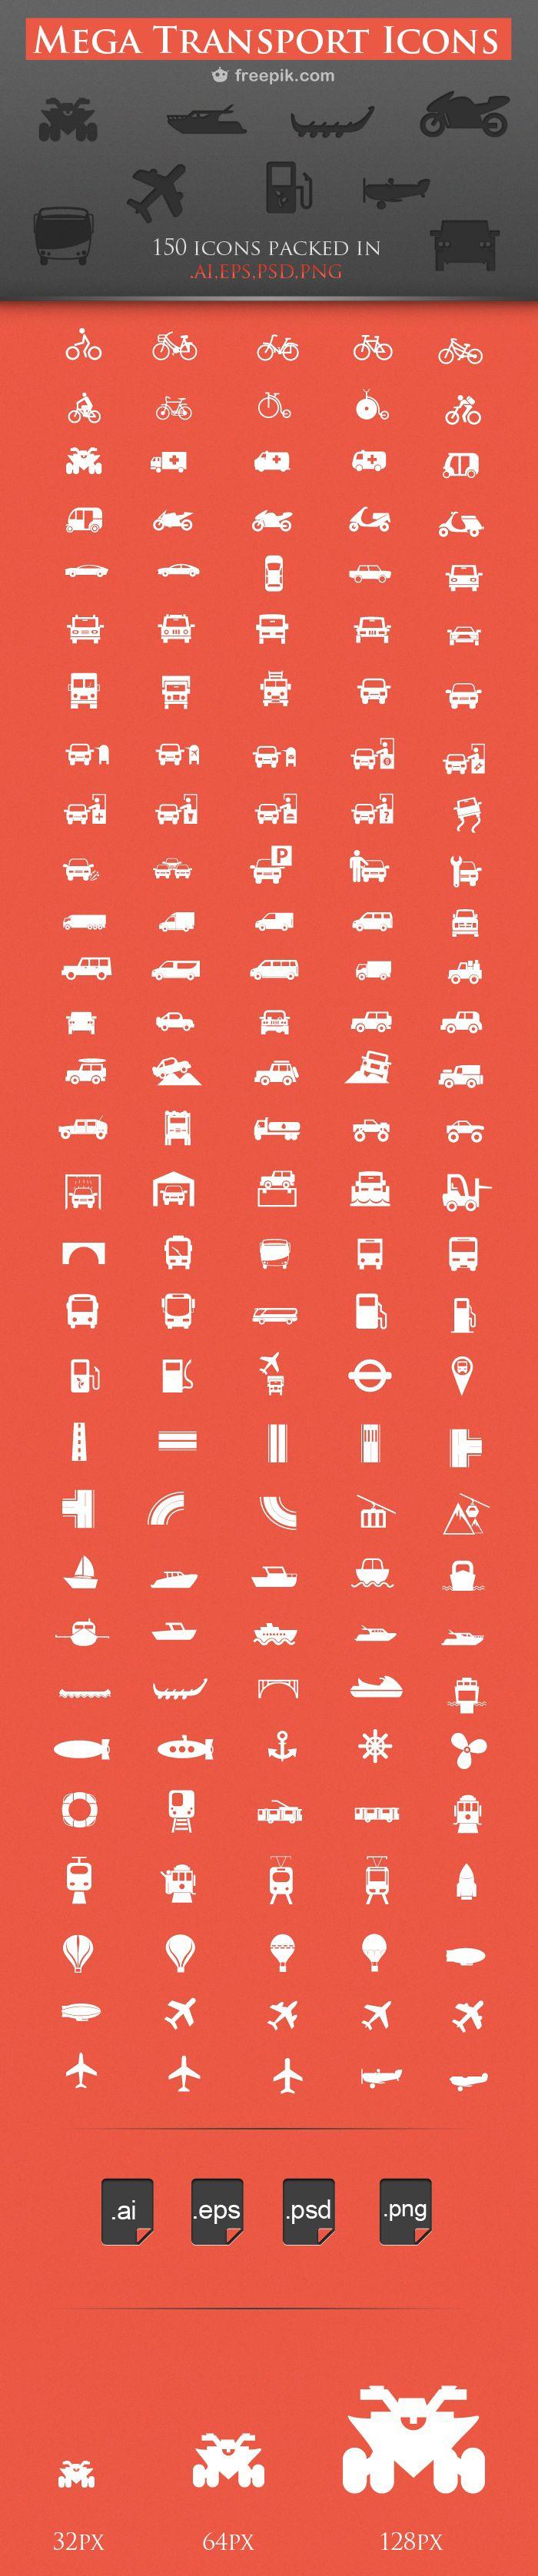 KDS Icons & Logos Inspirations Board by Freepick.com / Find us in www.kds.com.ar or Facebook/KDSARG and Twitter /KDSARG / Tags: #icons #logos #design